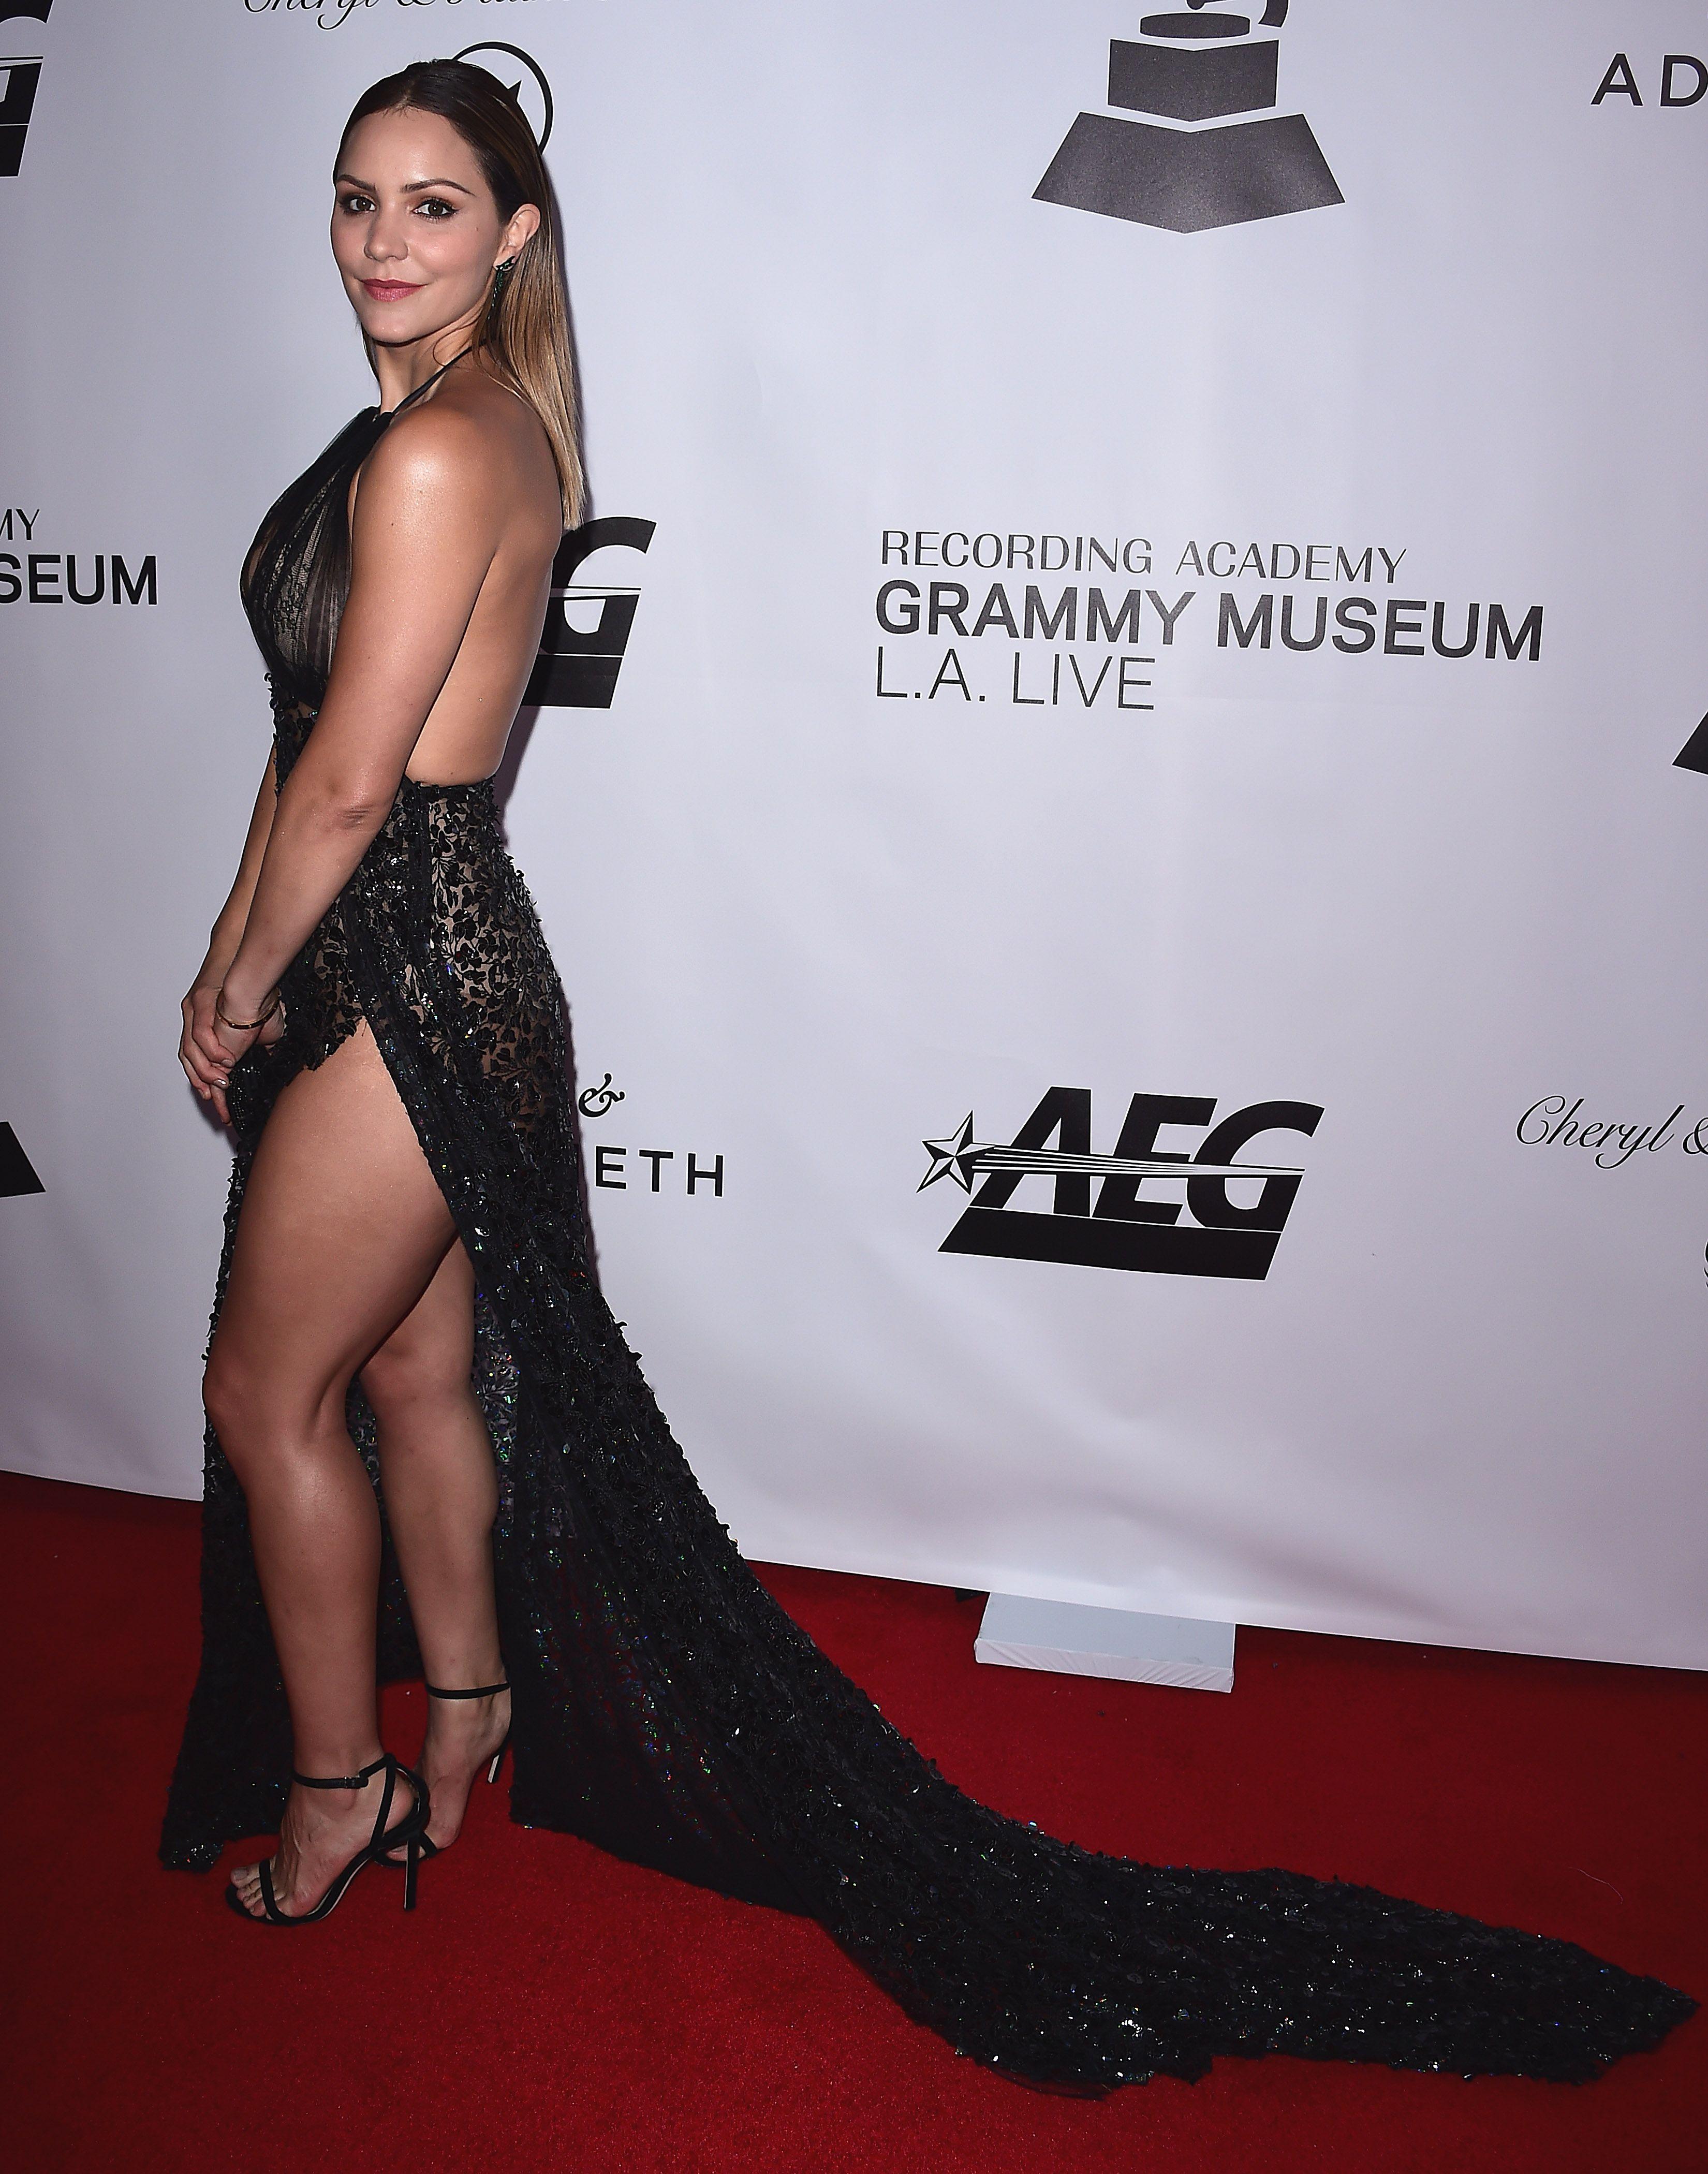 Katharine mcphee sexy photos nude (54 images)